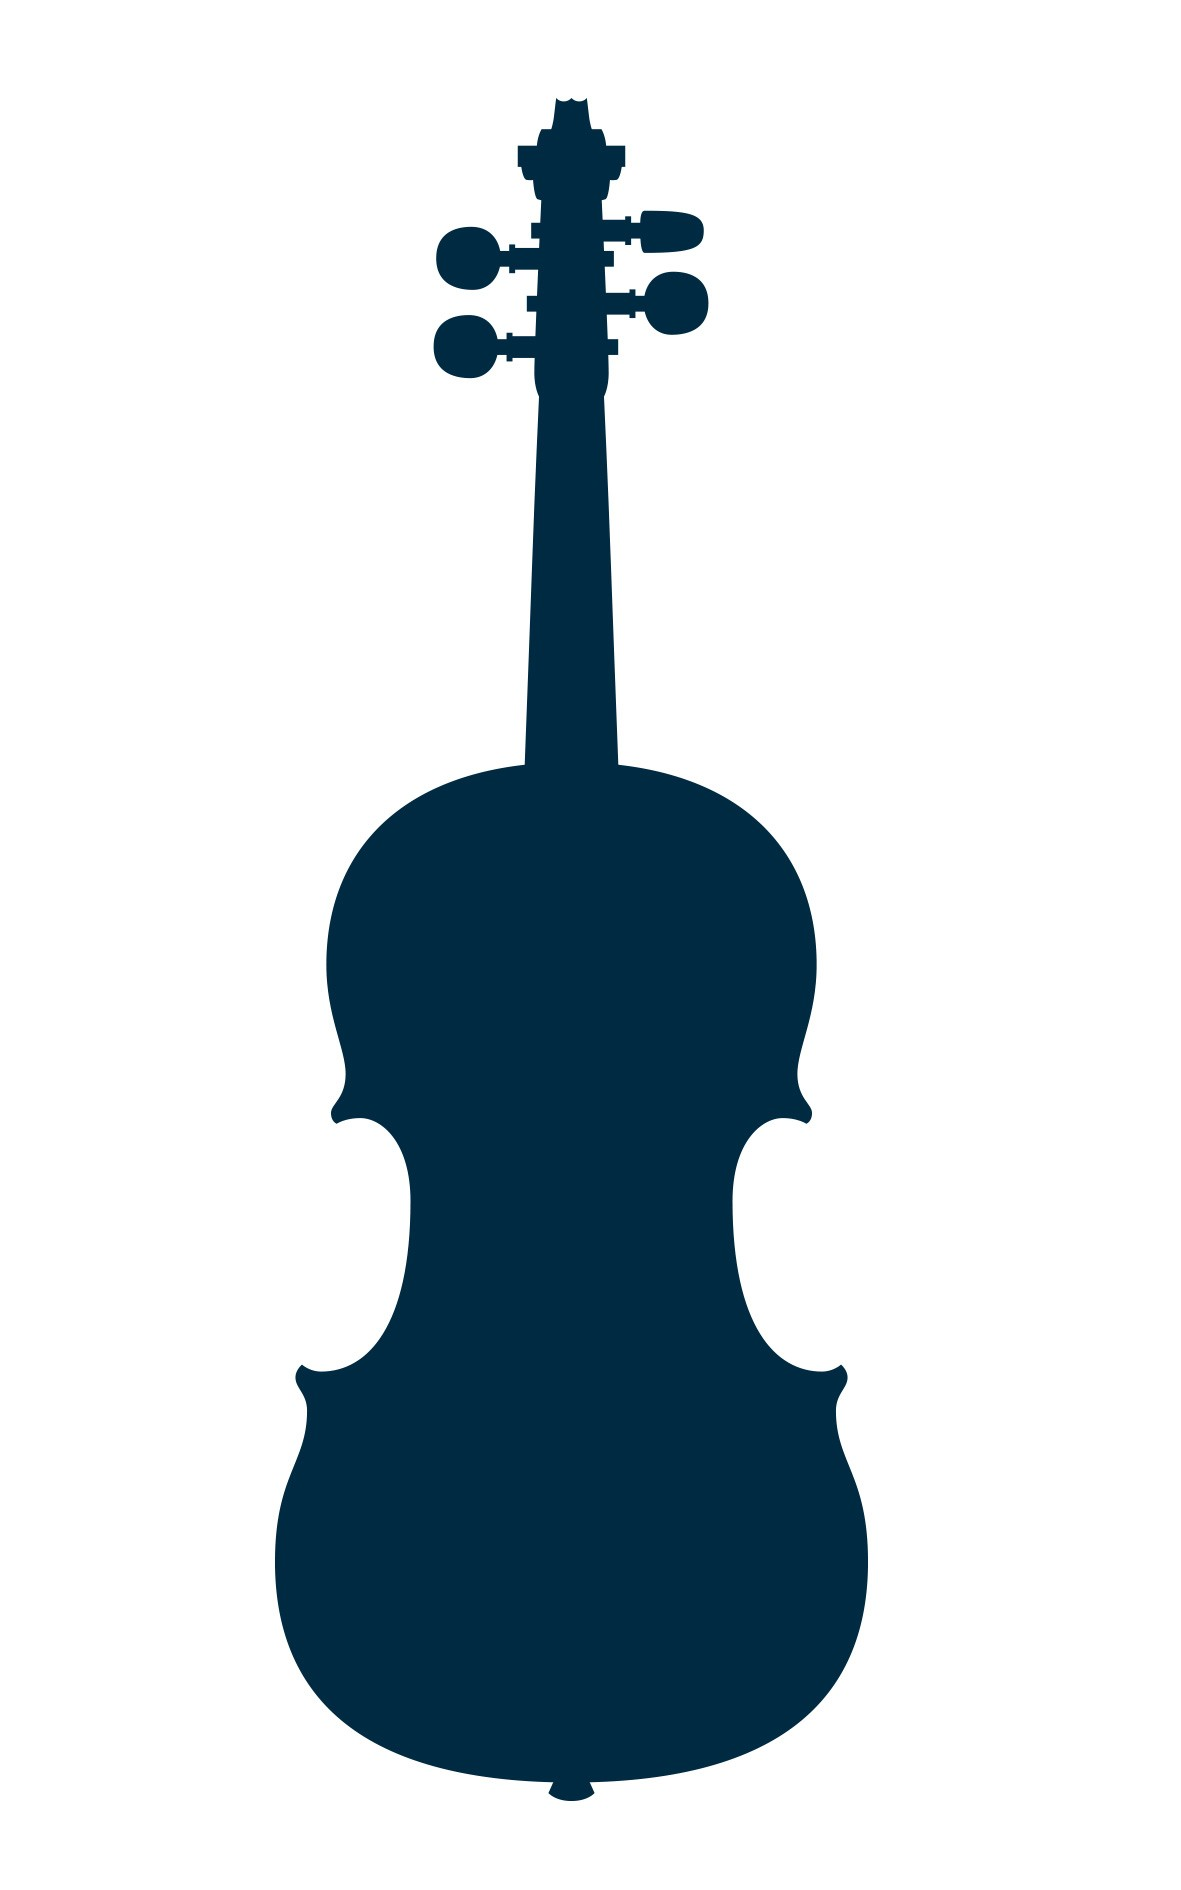 Dresden violin by Ackermann & Lesser